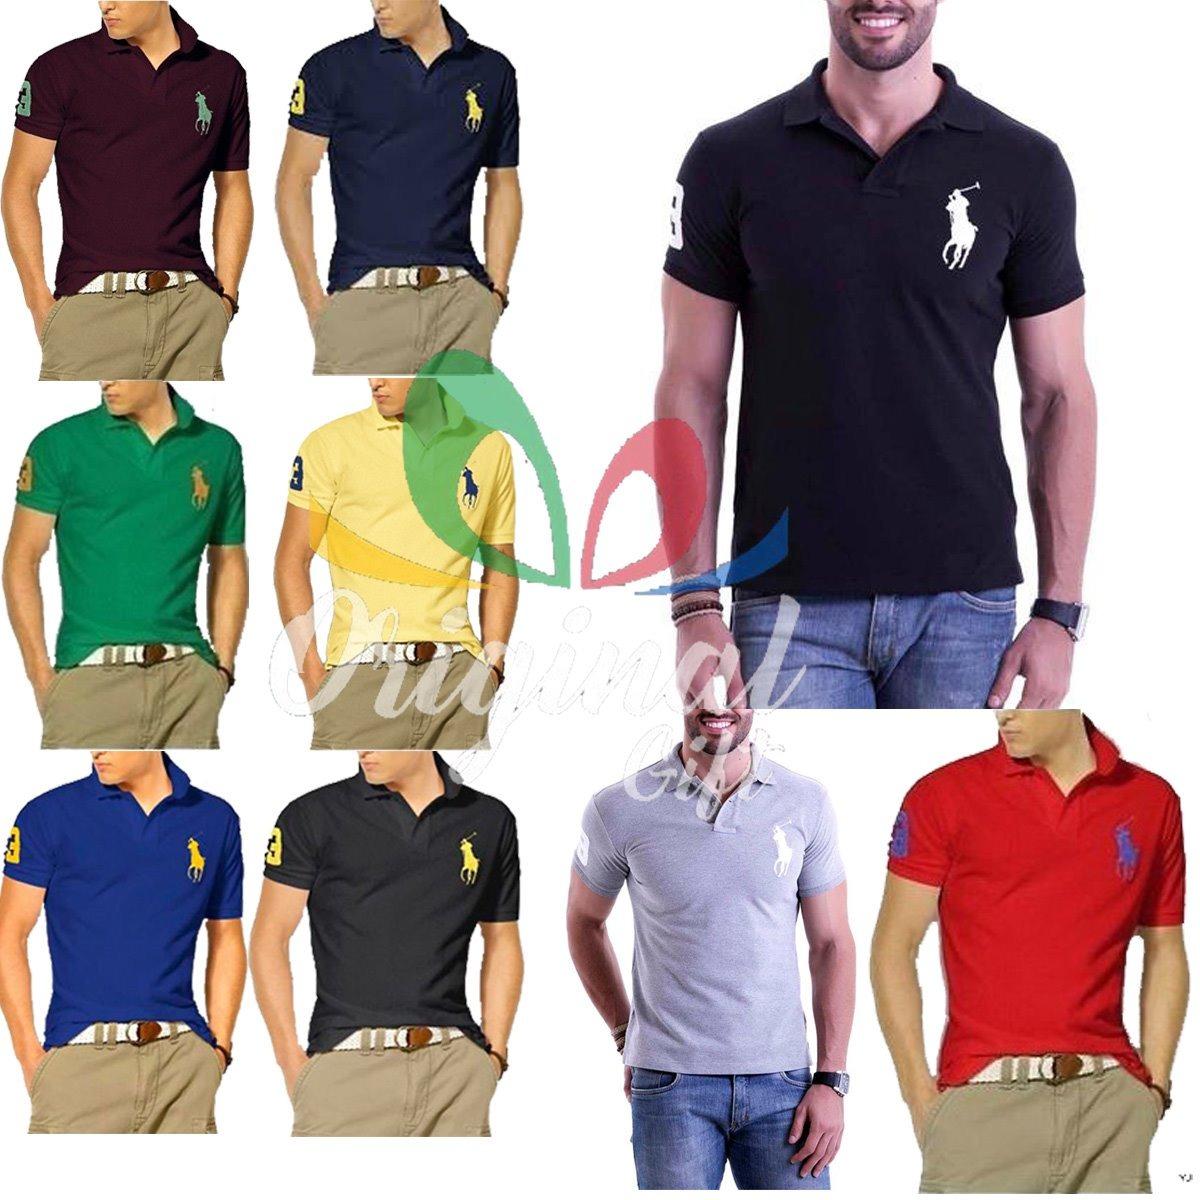 kit 20 camisa camiseta gola polo atacado revenda top. Carregando zoom. b8f89a2a1a12a